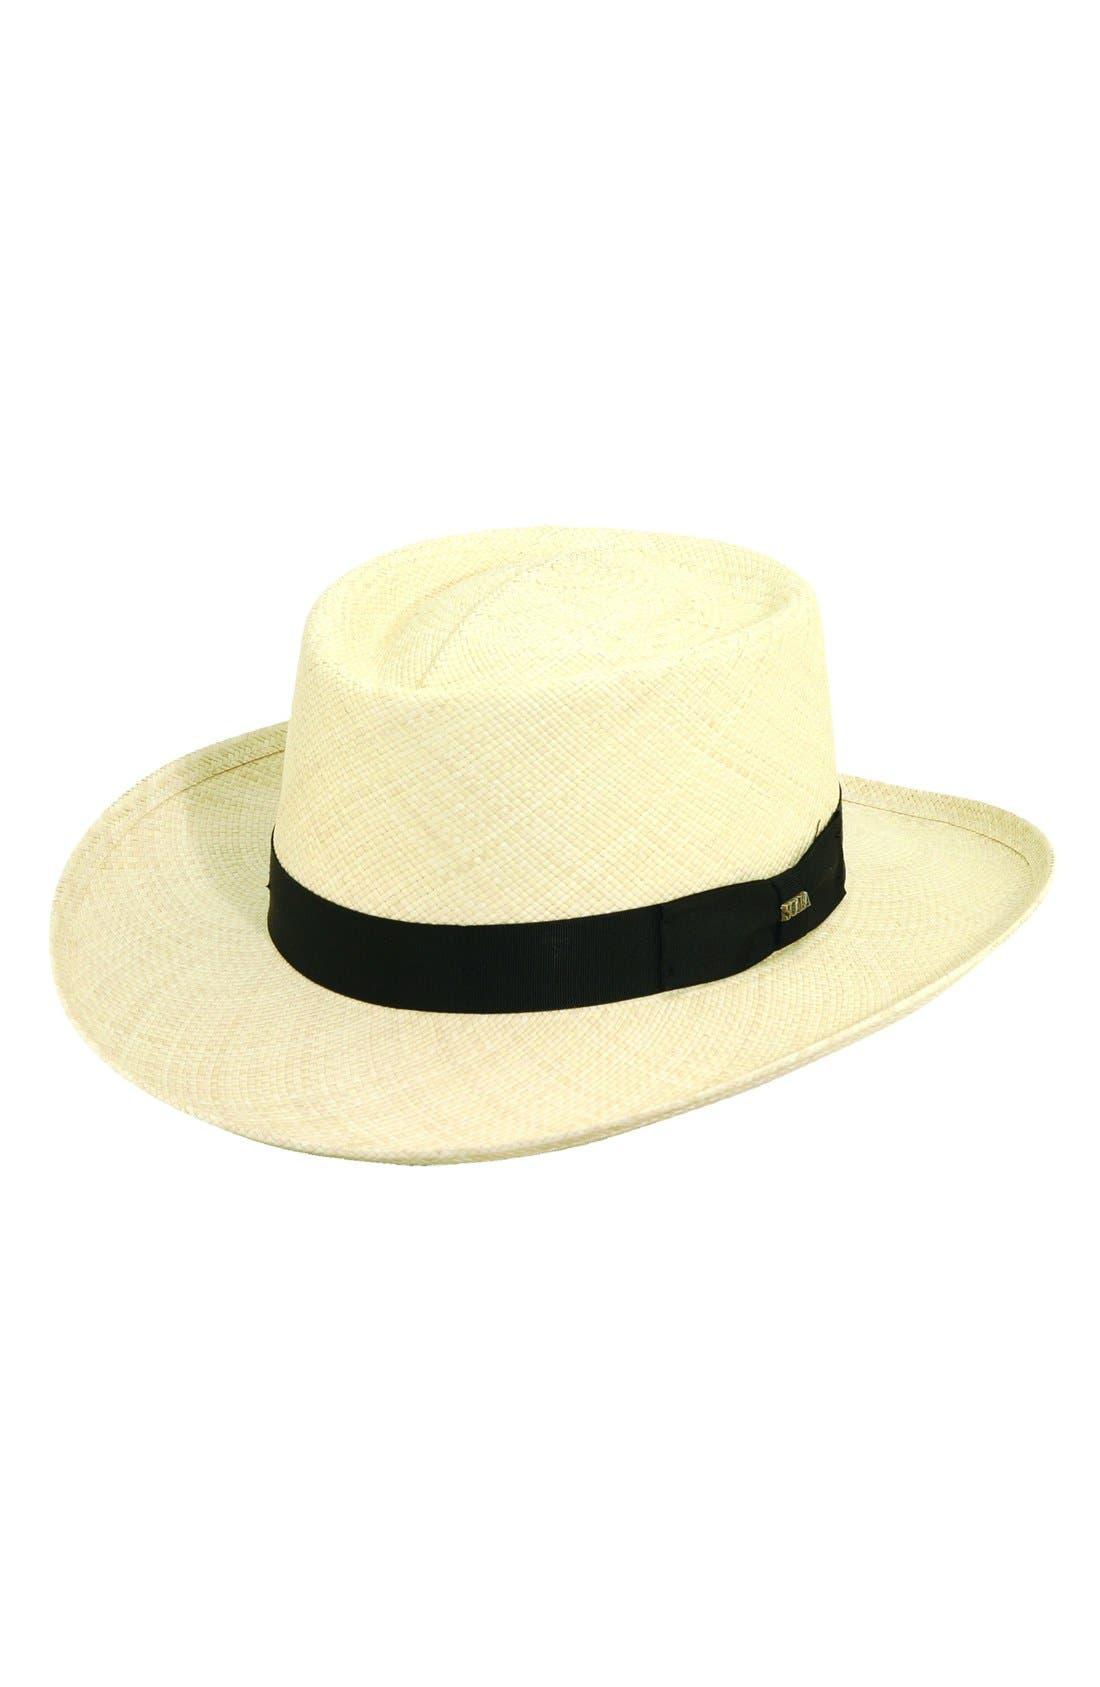 New Edwardian Style Men's Hats 1900-1920 Mens Scala Panama Straw Gambler Hat - White $115.00 AT vintagedancer.com